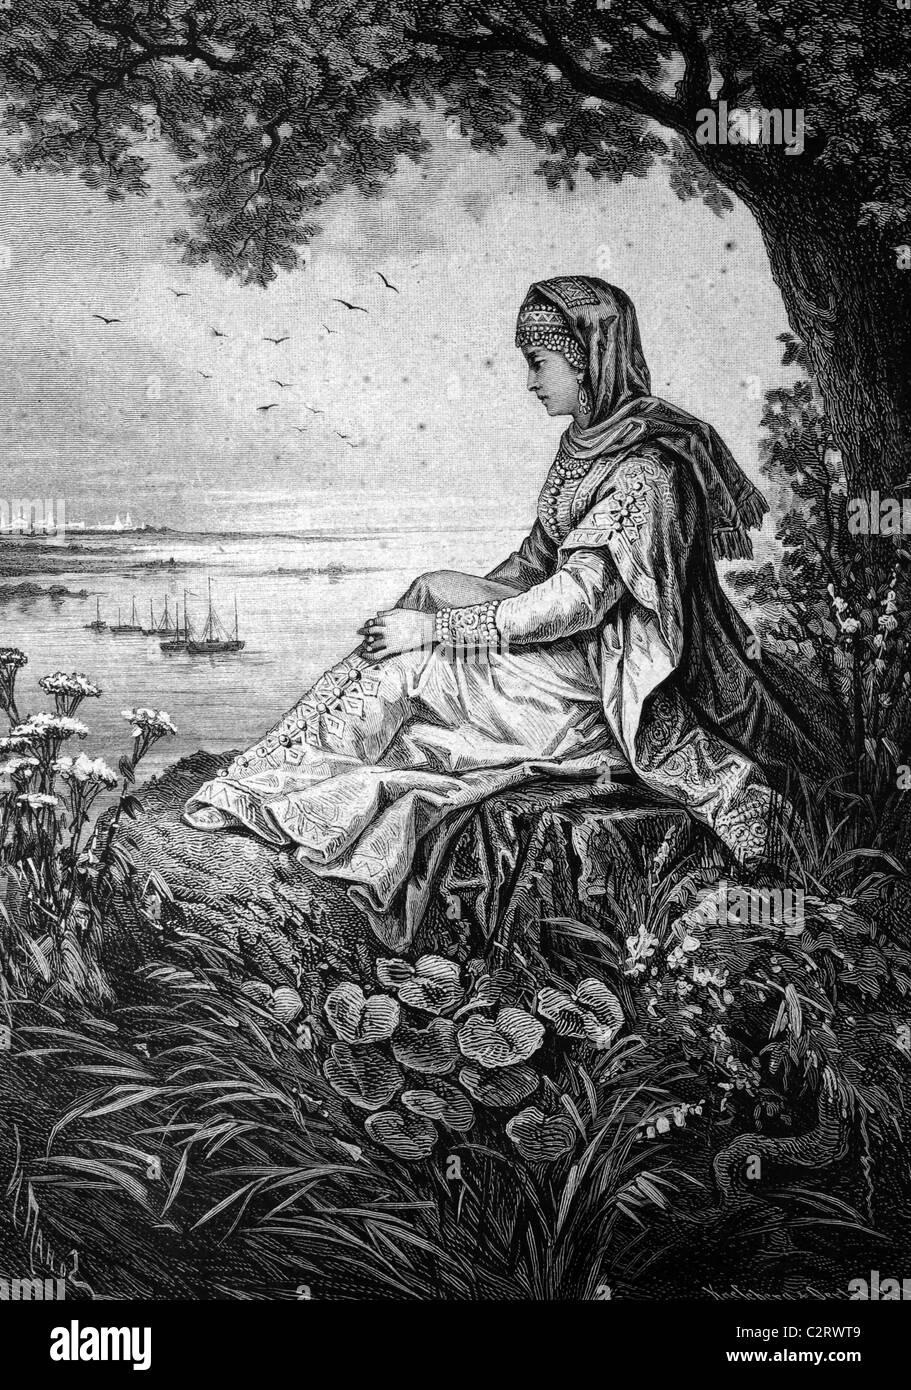 Fédération de Boyarina, xvie siècle, illustration historique, vers 1886 Photo Stock